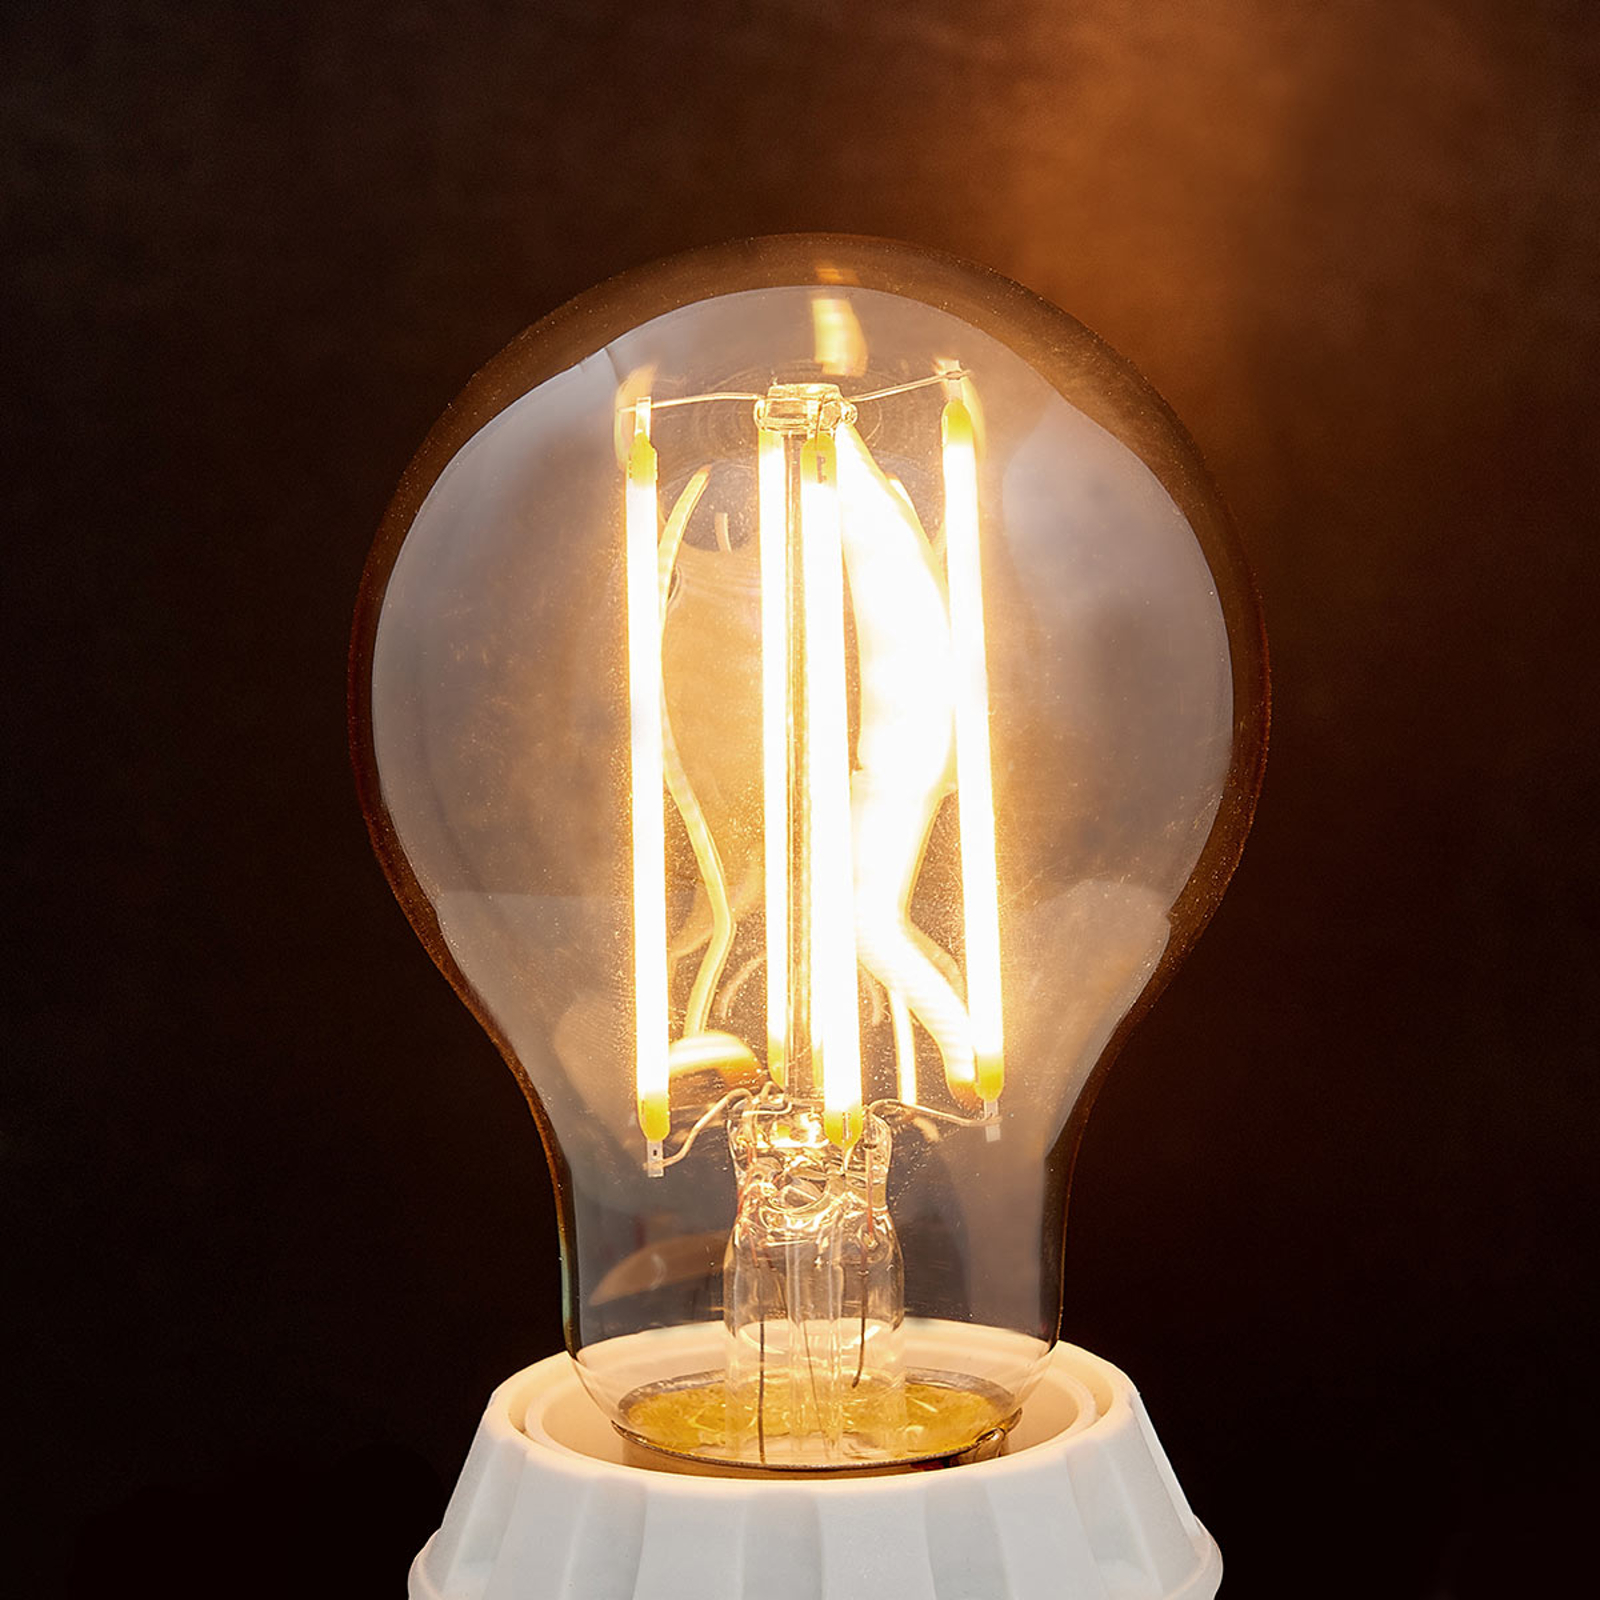 E27-LED-filamenttilamppu 6 W 500 lm ambra 2200 K